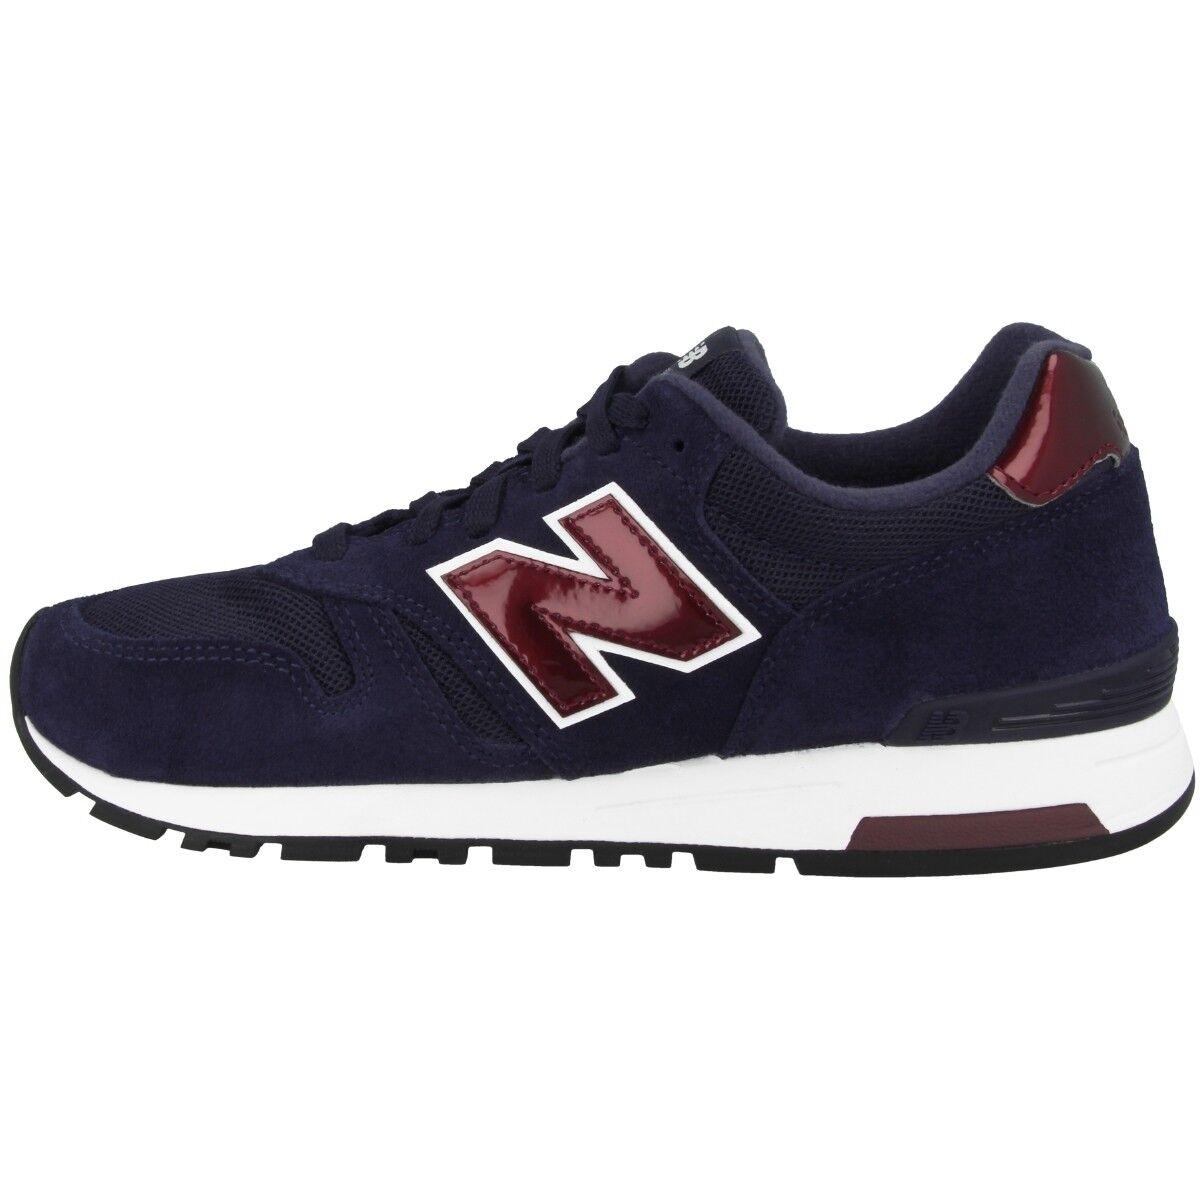 New Balance WL 565 NCW damen Schuhe Damen Freizeit Turnschuhe navy WL565NCW